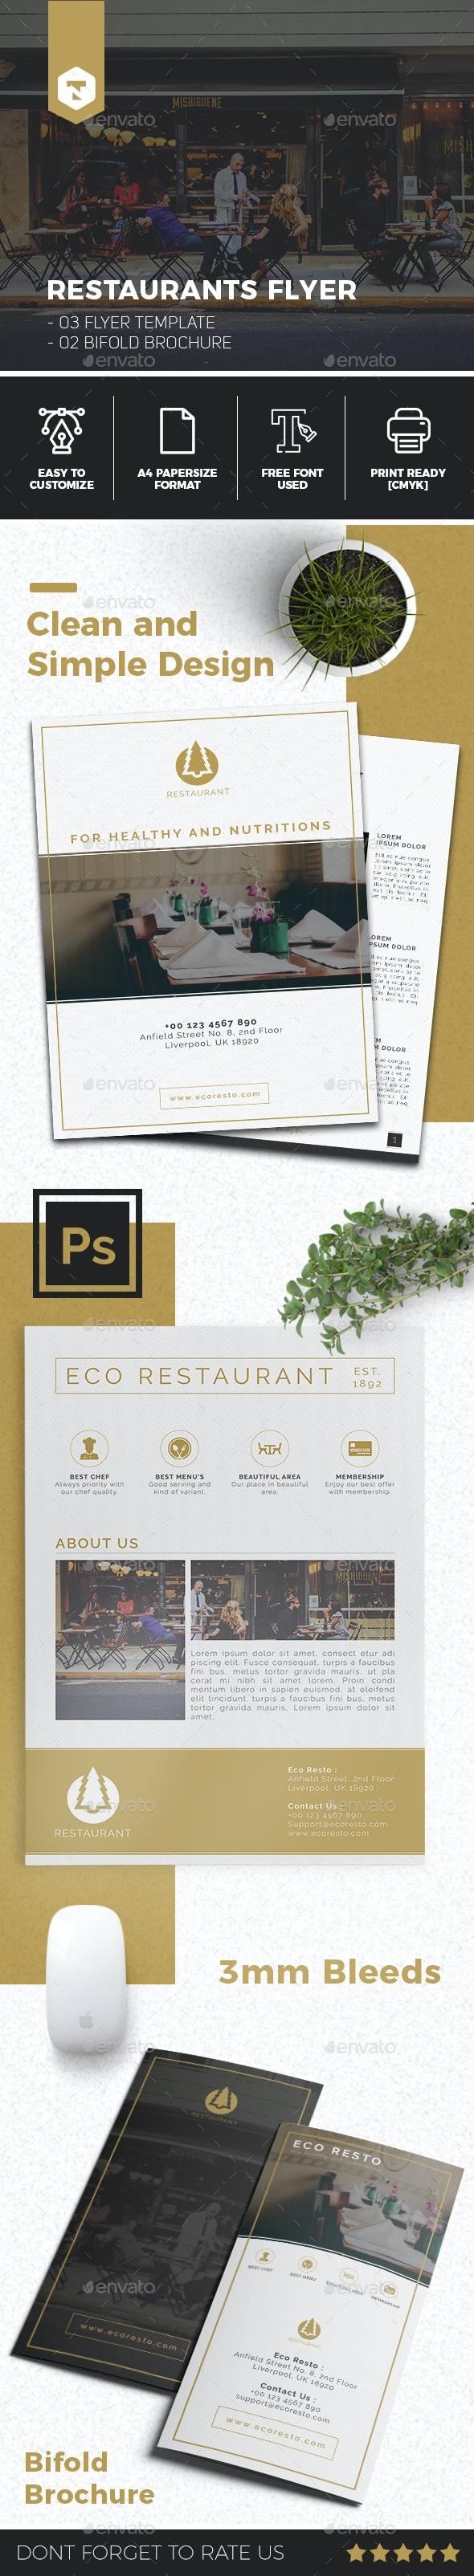 Restaurant Flyer Template - Flyers Print Templates